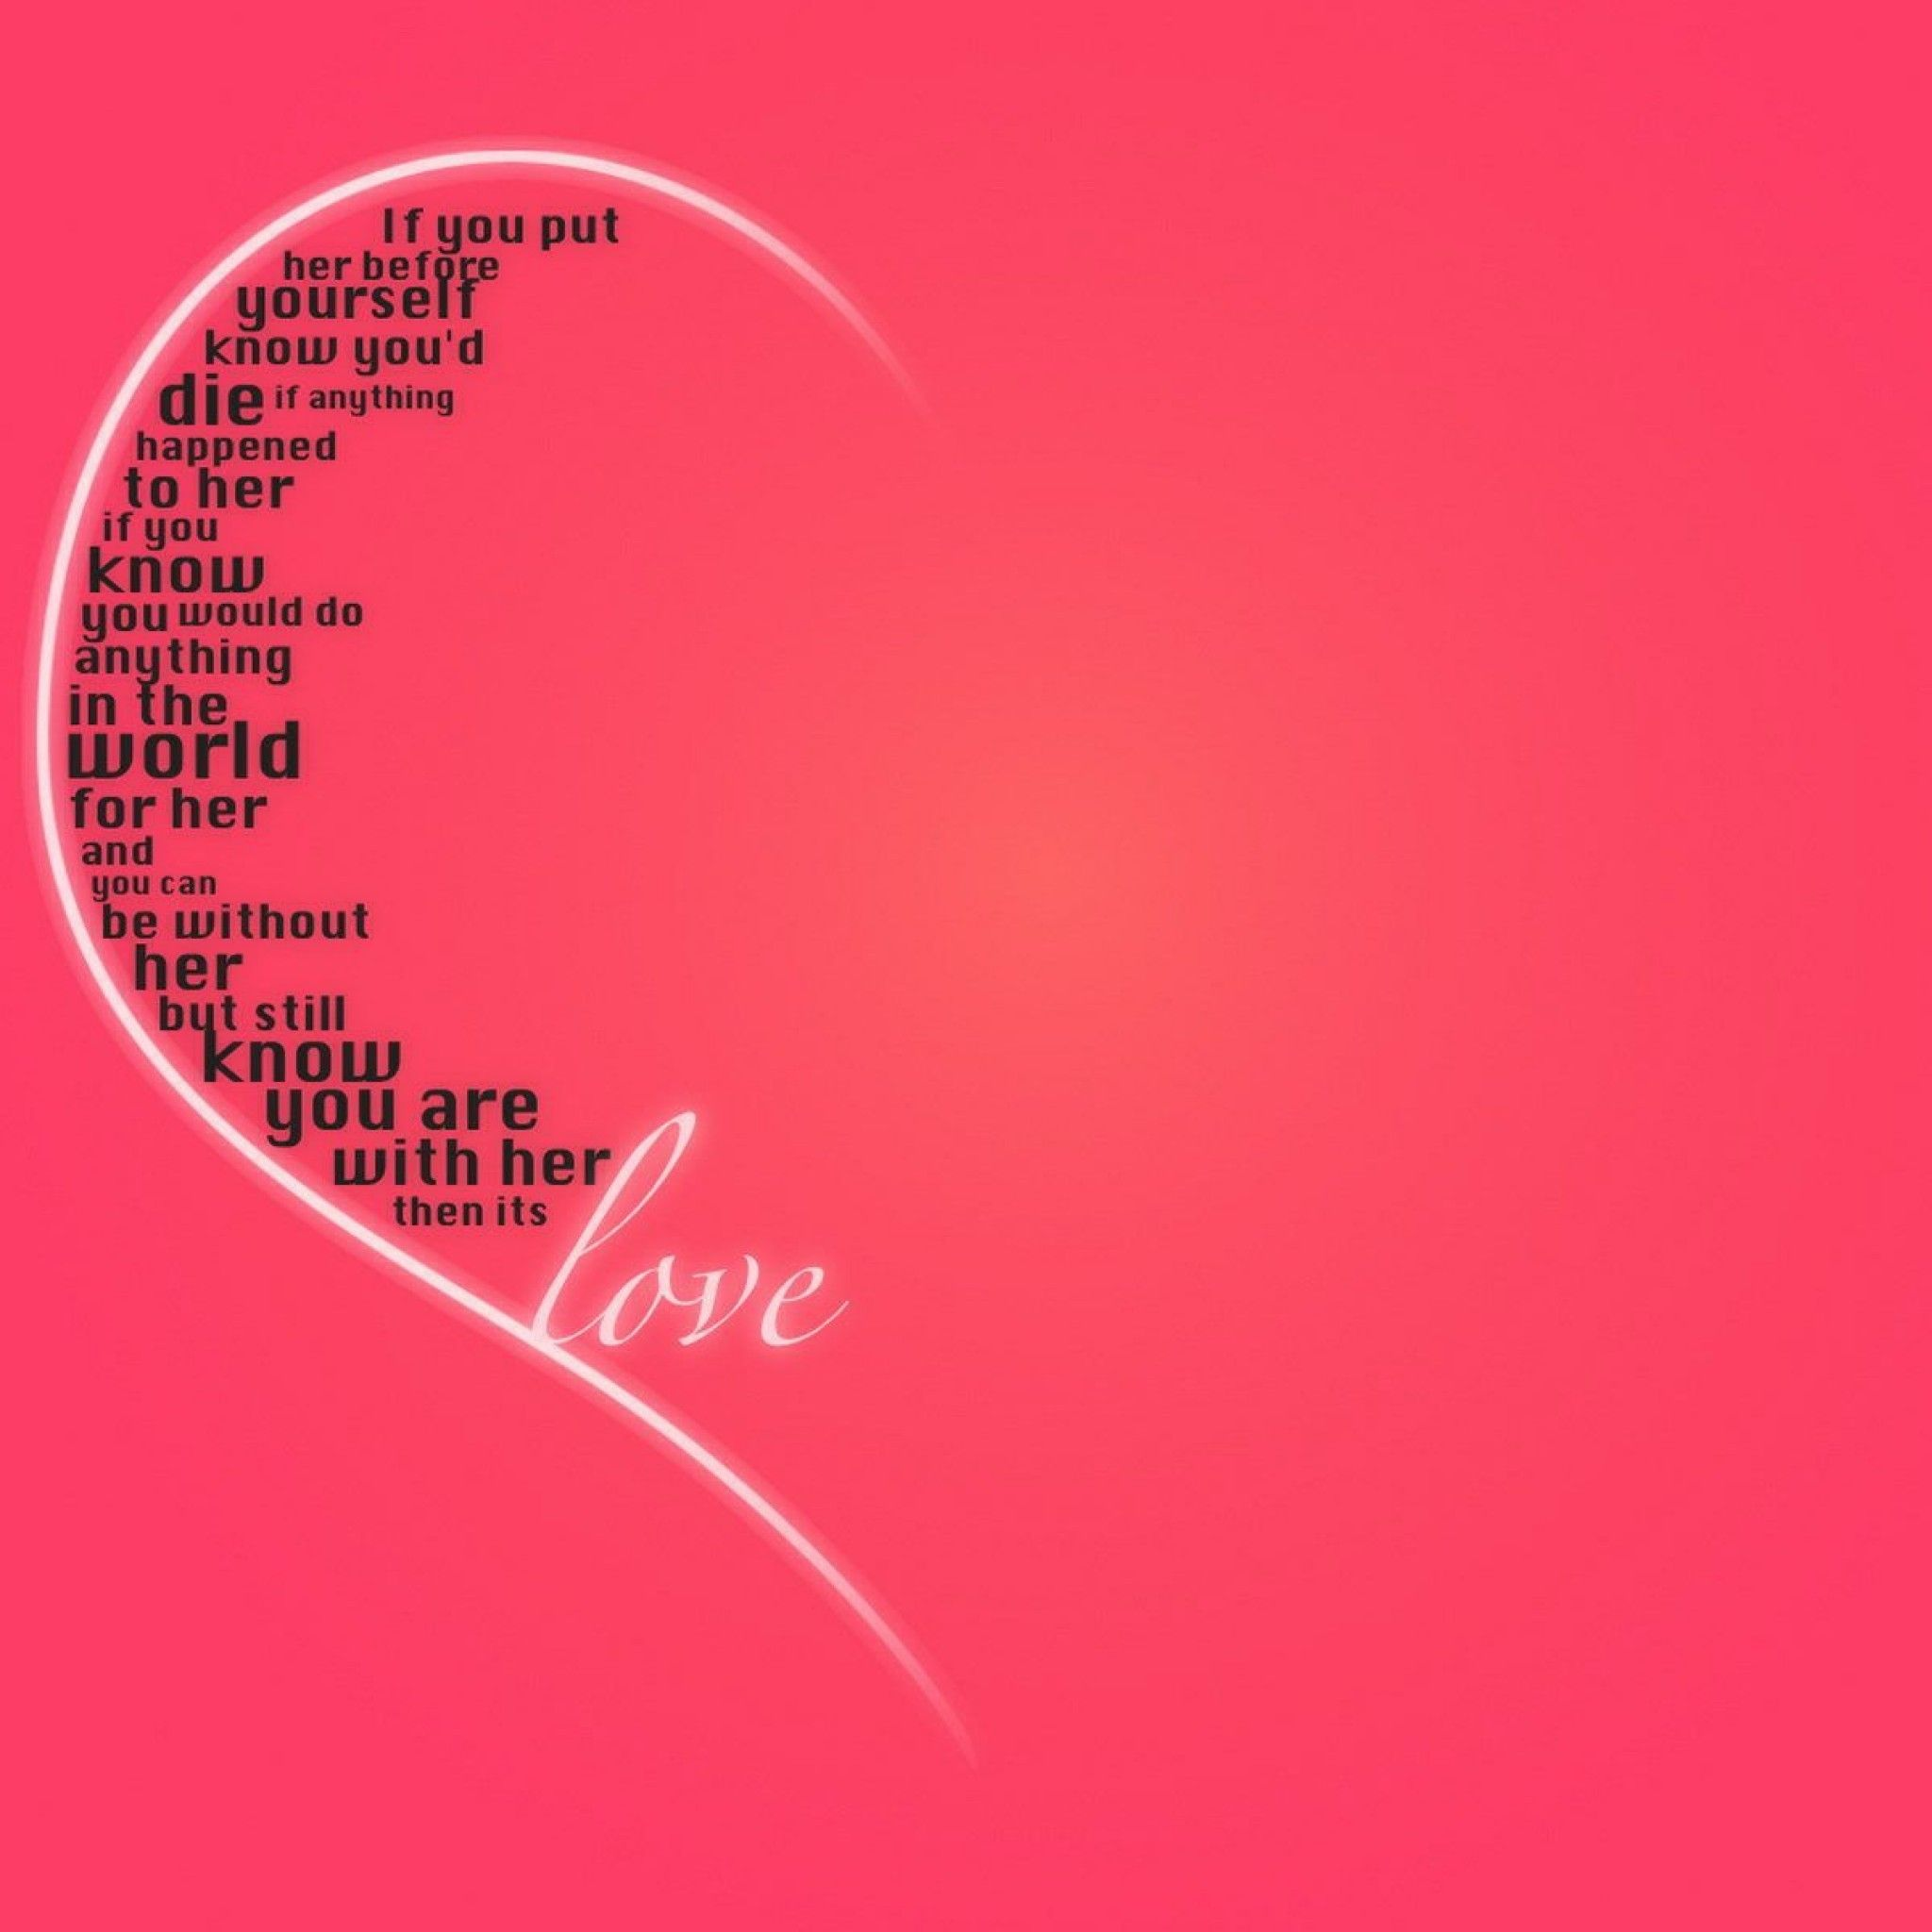 Https All Images Net Wallpaper Iphone Love Hd 53 Wallpaper Iphone Love Hd 53 Check More At Https All Images Net Wallpaper Iphone Love Hd 53 Ahne